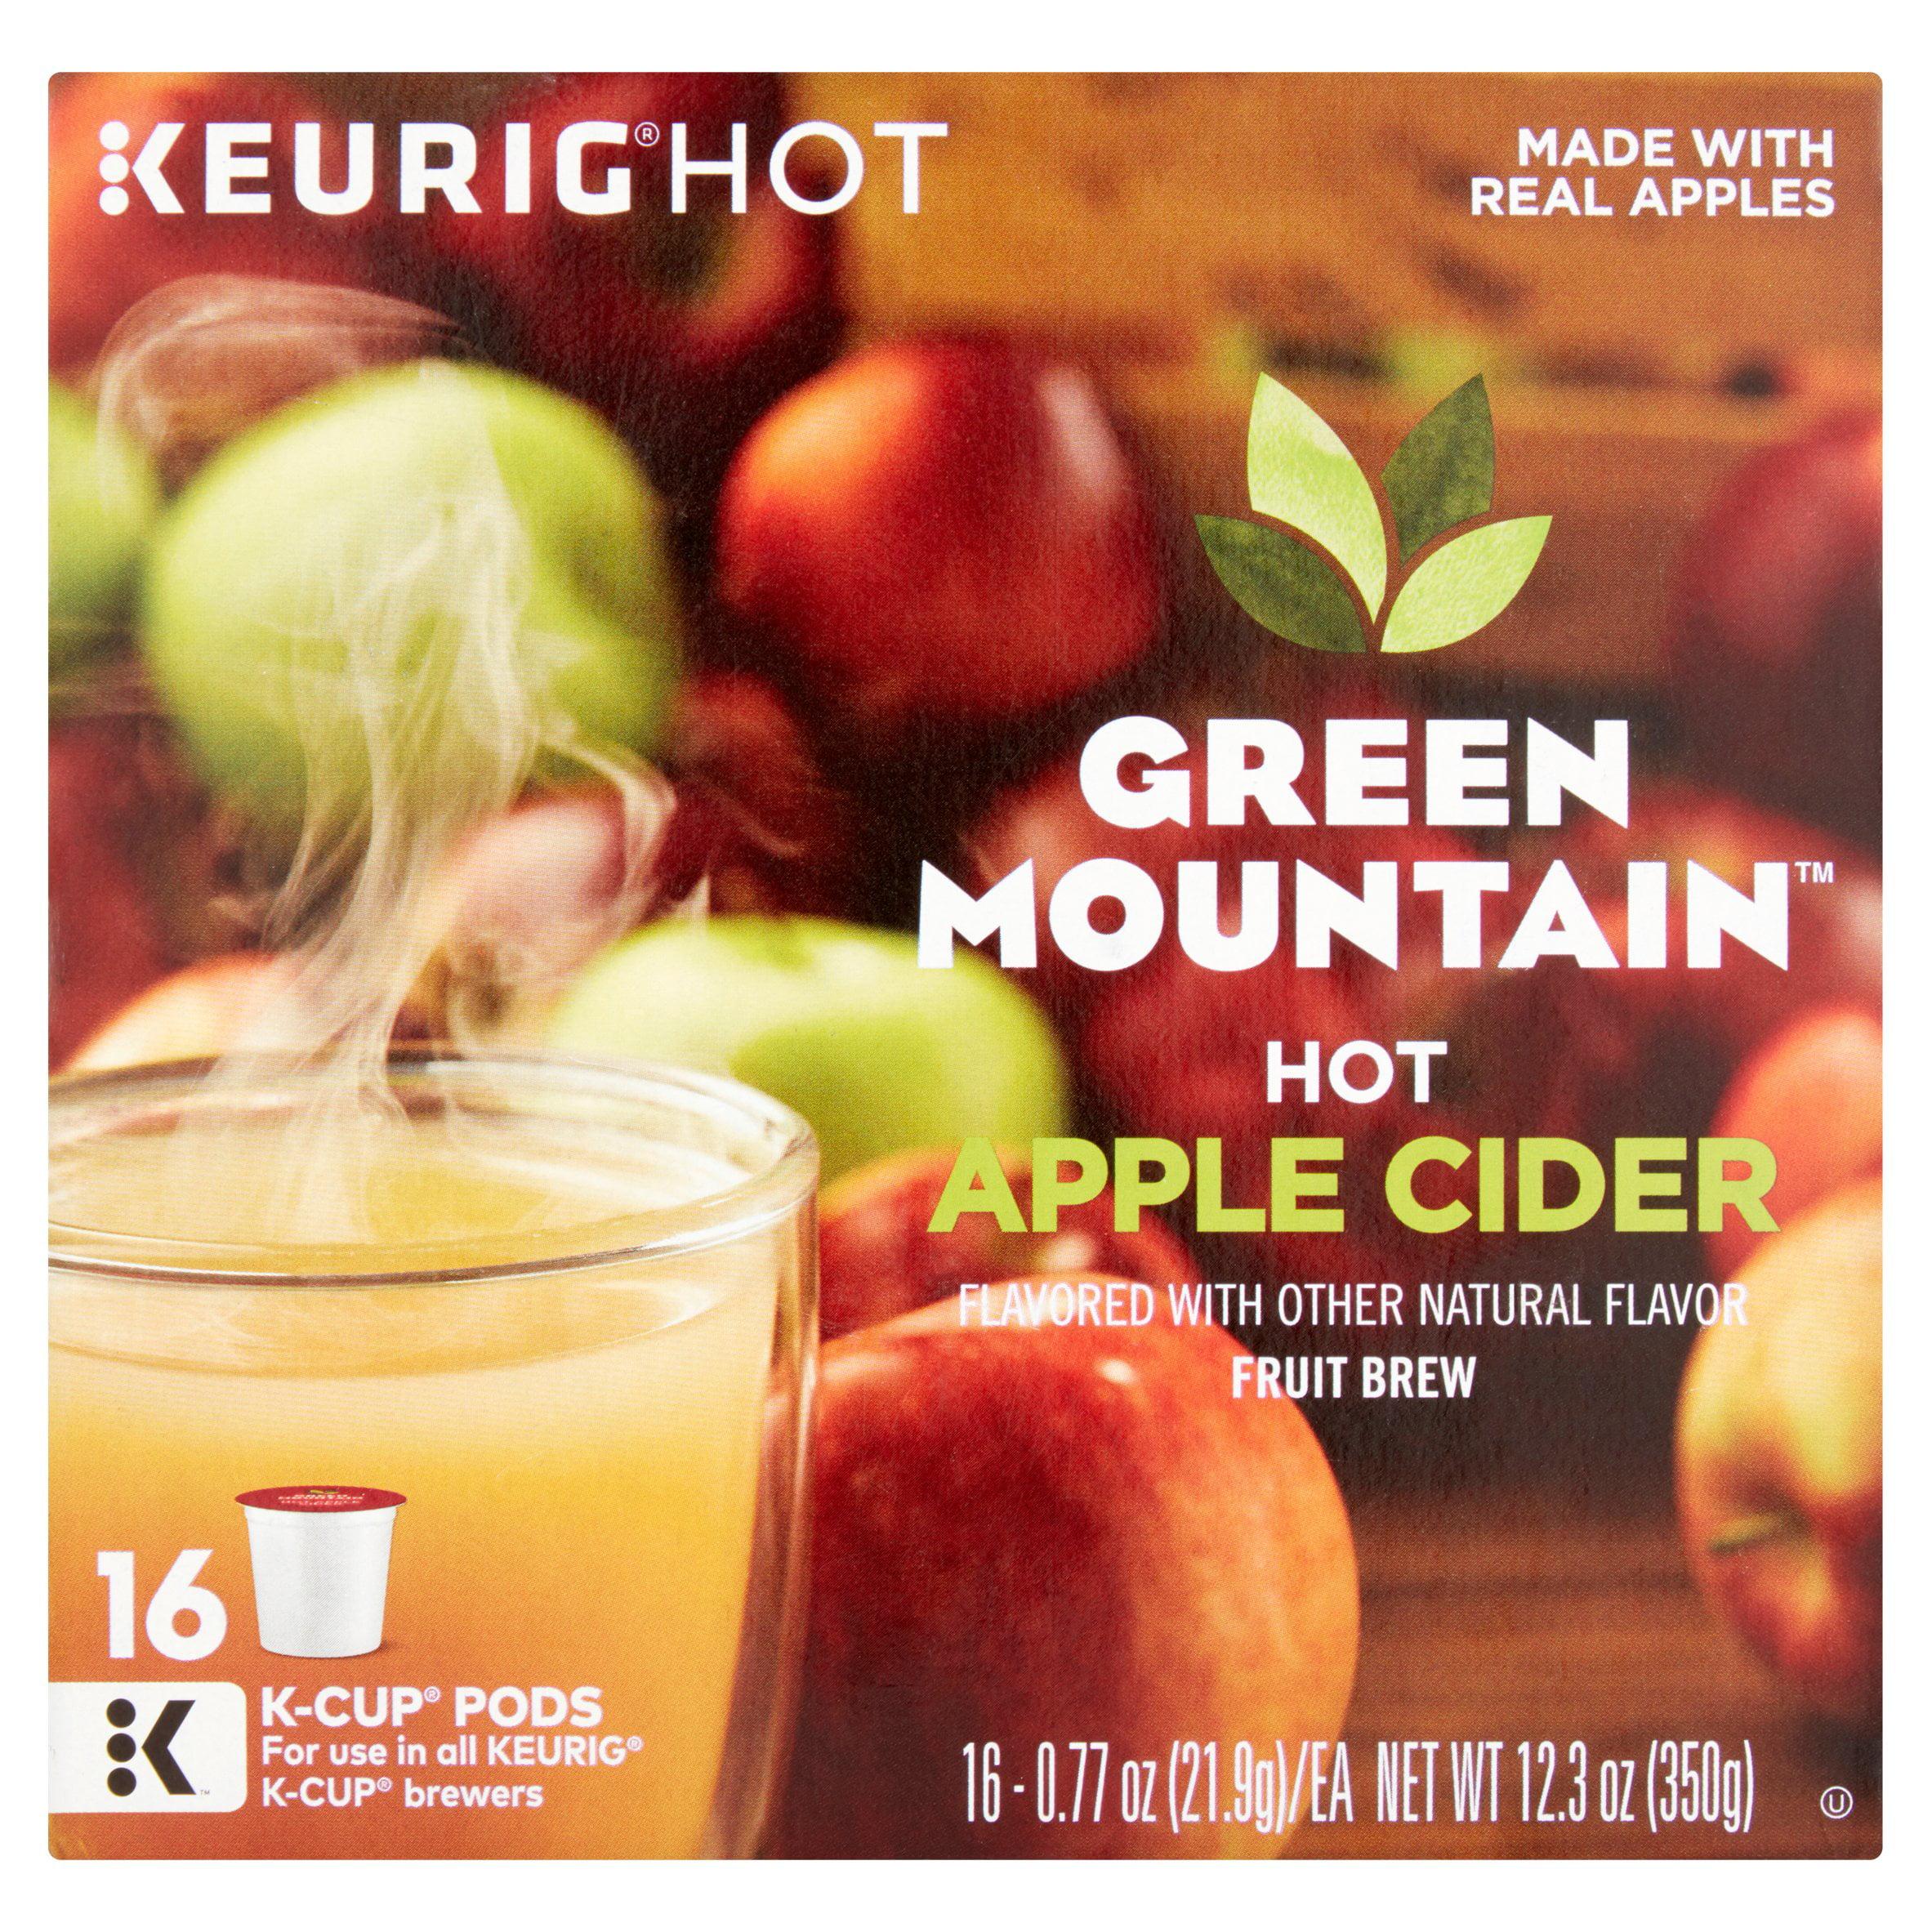 Keurig Hot Green Mountain Hot Apple Cider Fruit Brew K-Cup Pods, 0.77 oz, 16 count